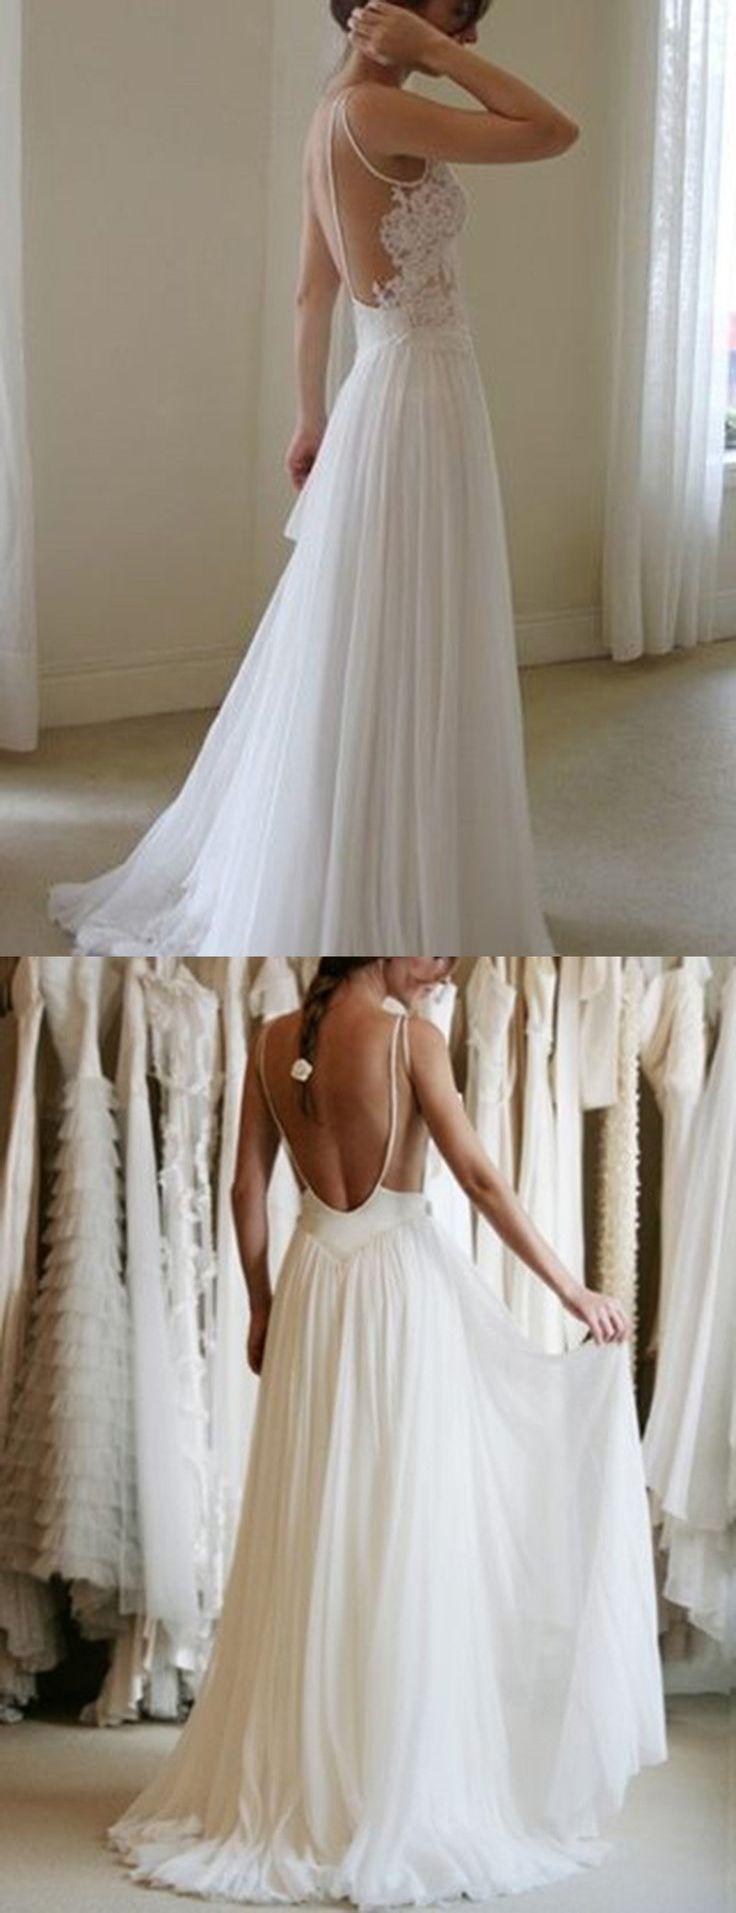 Backless lace wedding dresses pinterest - valuedirectories.info